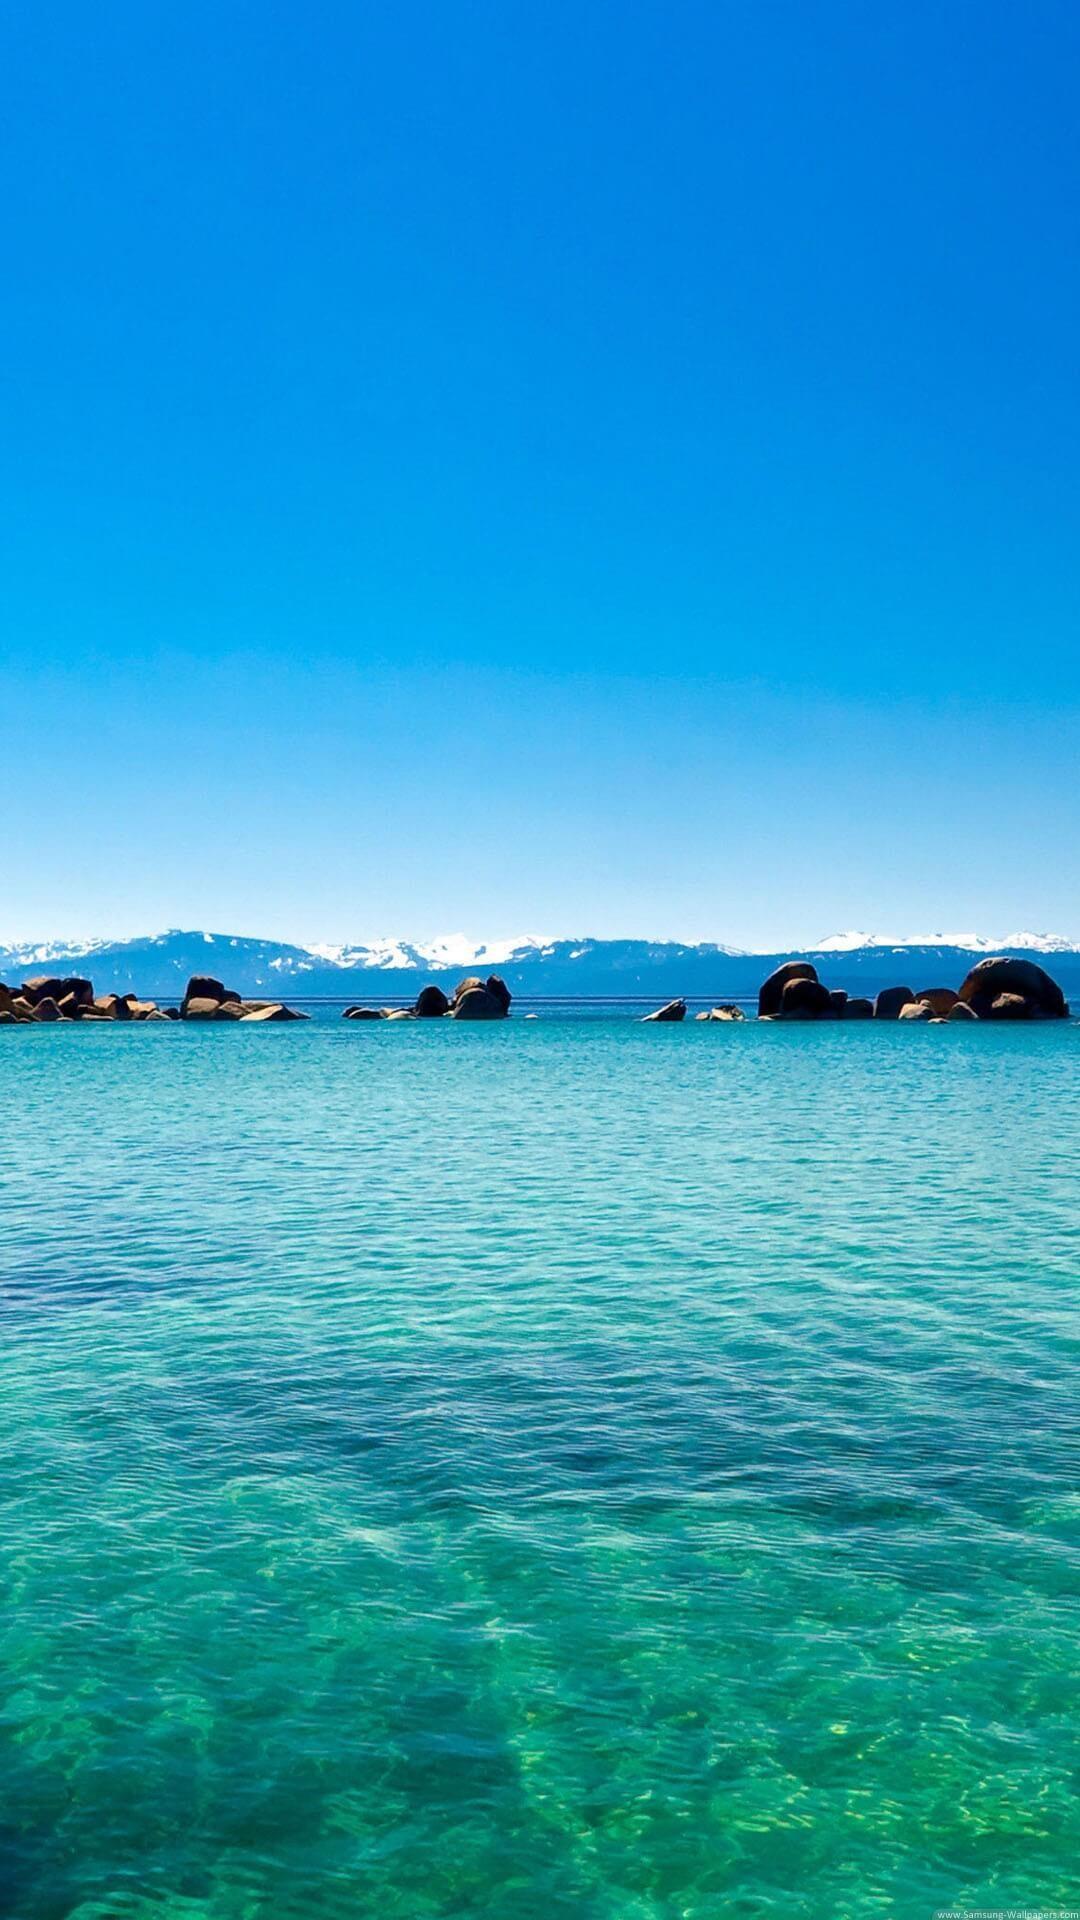 How to download HD Blue ocean iPhone Wallpaper:-